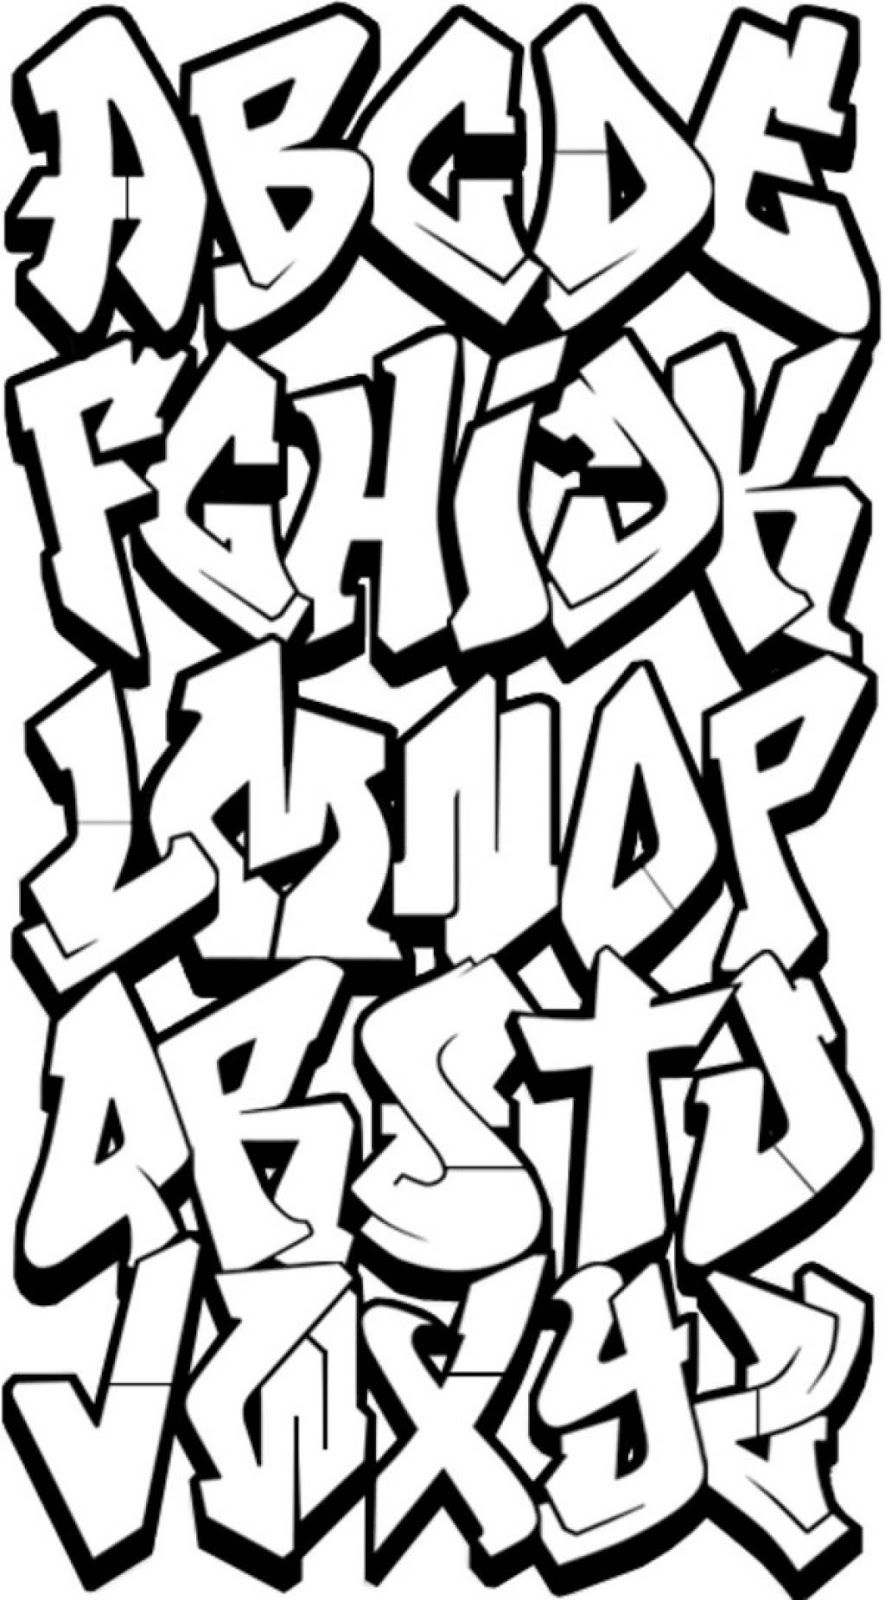 Graffiti Letters Az Alphabet Draw Step 3D Styles Free Letter - Free Printable Graffiti Letters Az